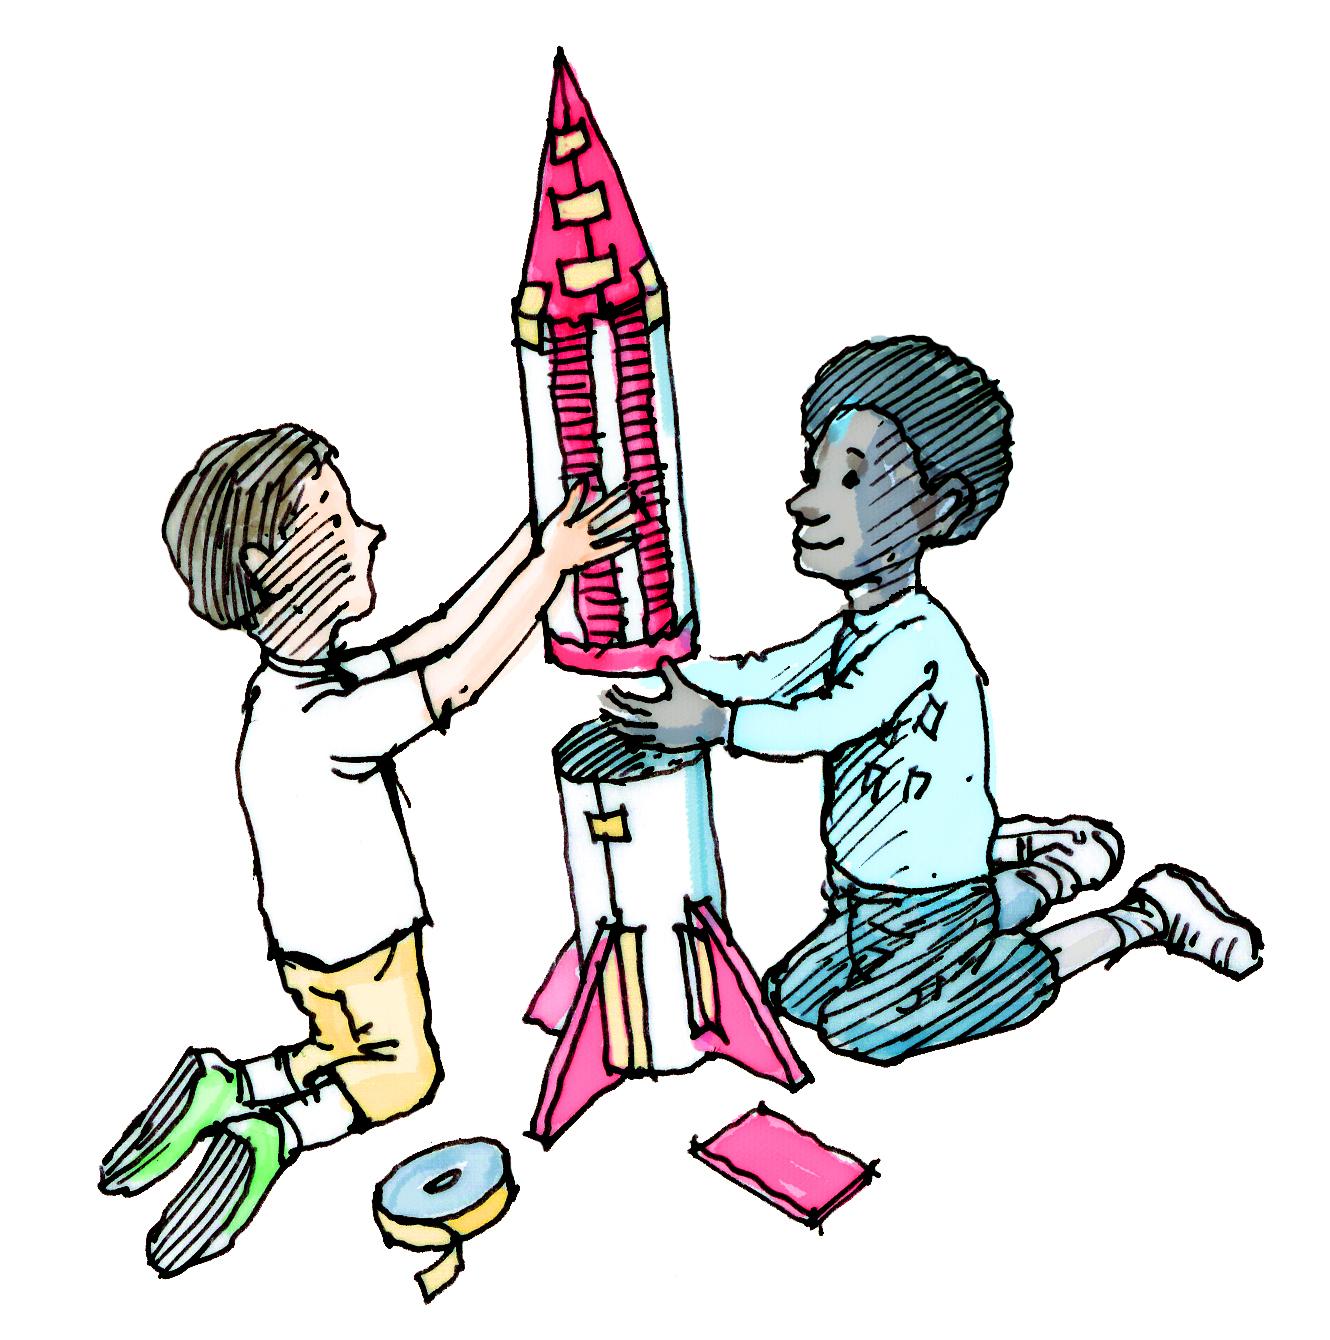 children building a paper rocket